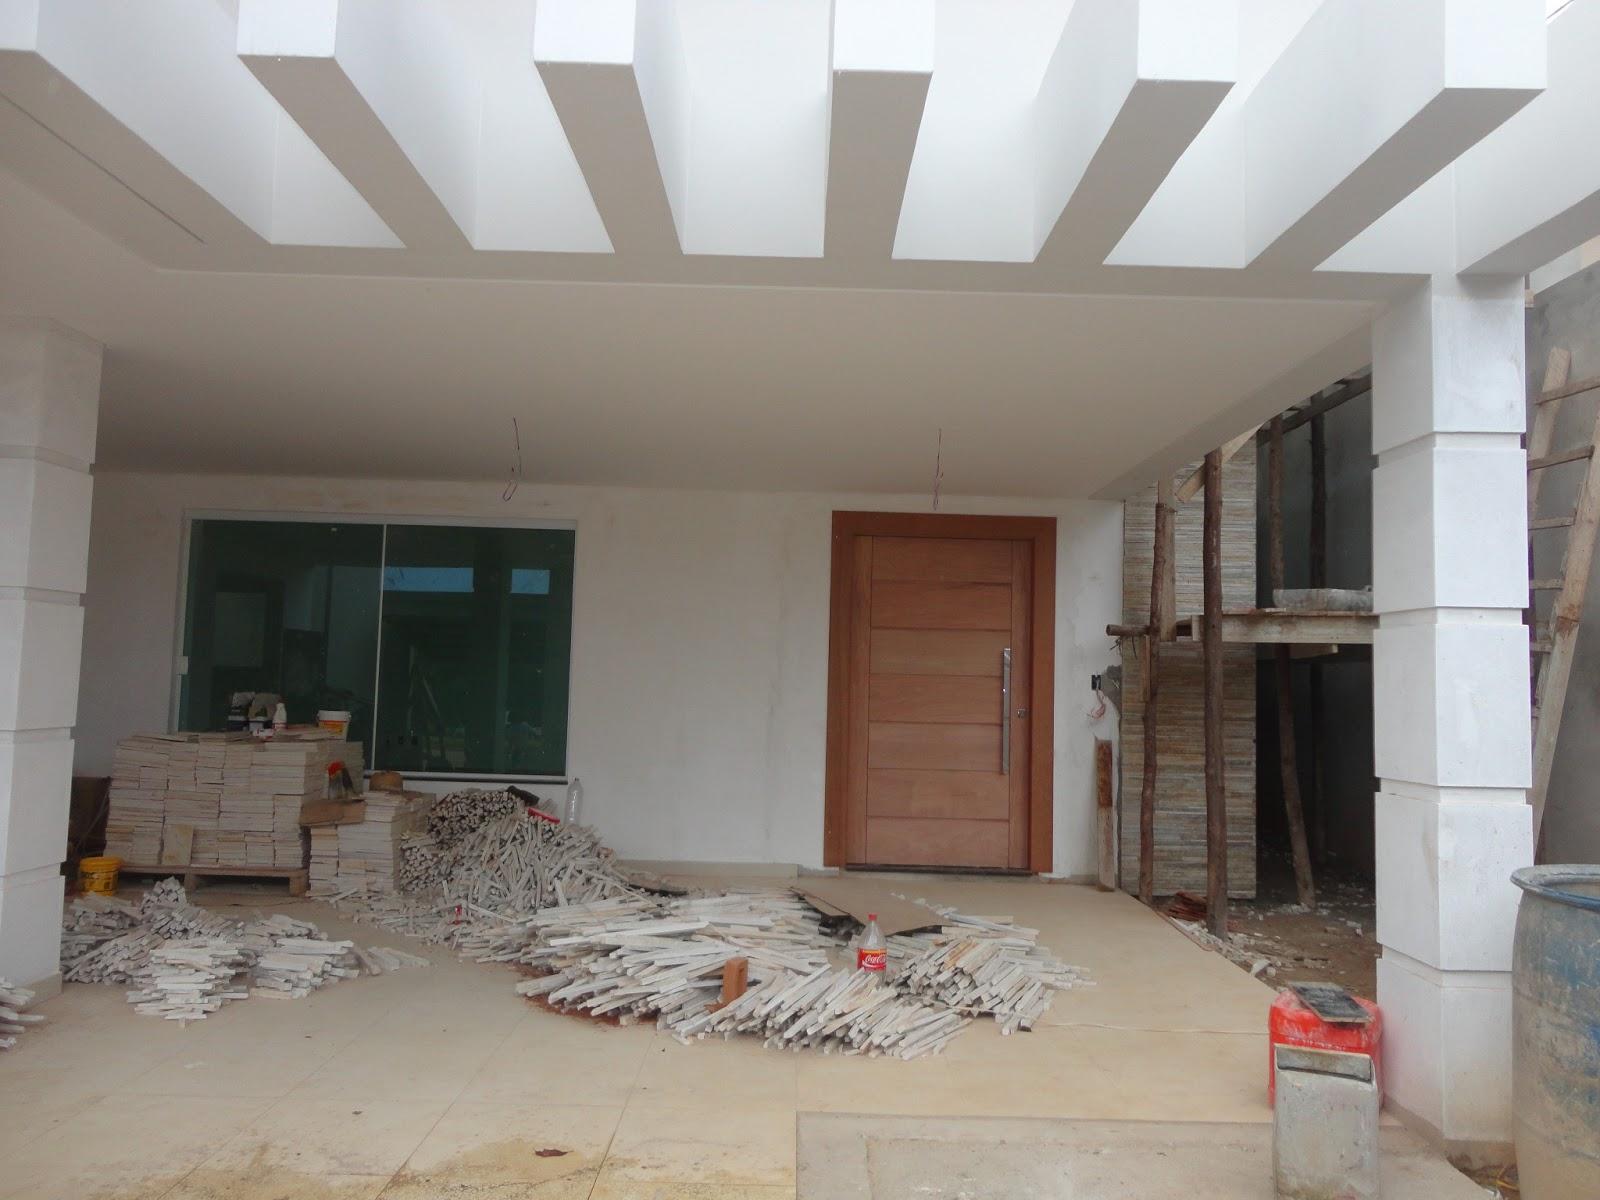 #9C342F nossa casa nosso sonho : Porta pivotante linda! 246 Janelas De Vidro Pivotantes